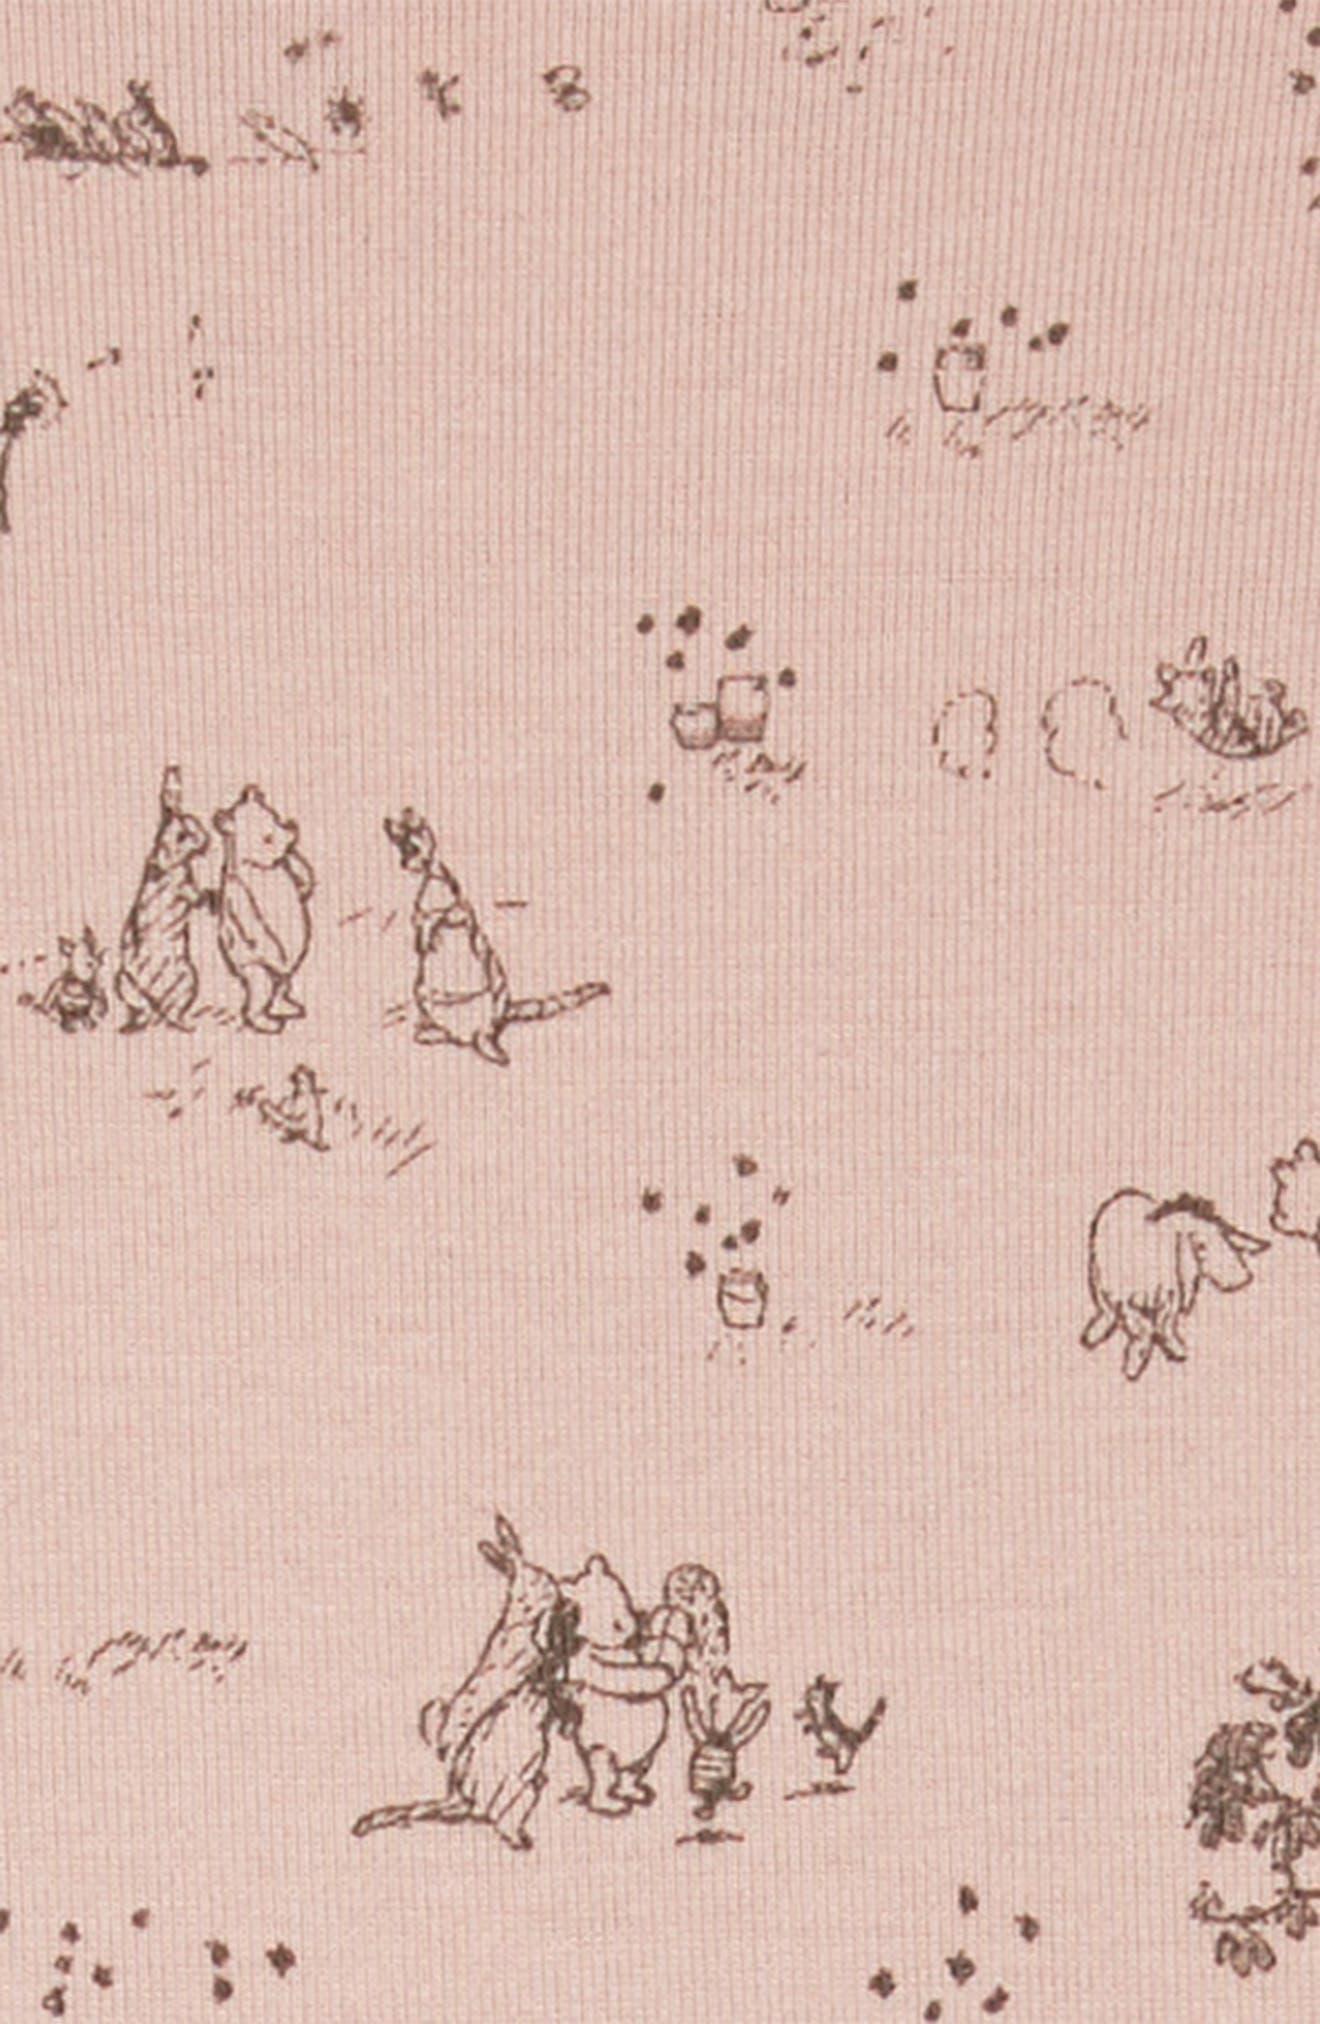 x Disney<sup>®</sup> Winnie the Pooh Print Dress,                             Alternate thumbnail 3, color,                             Powder